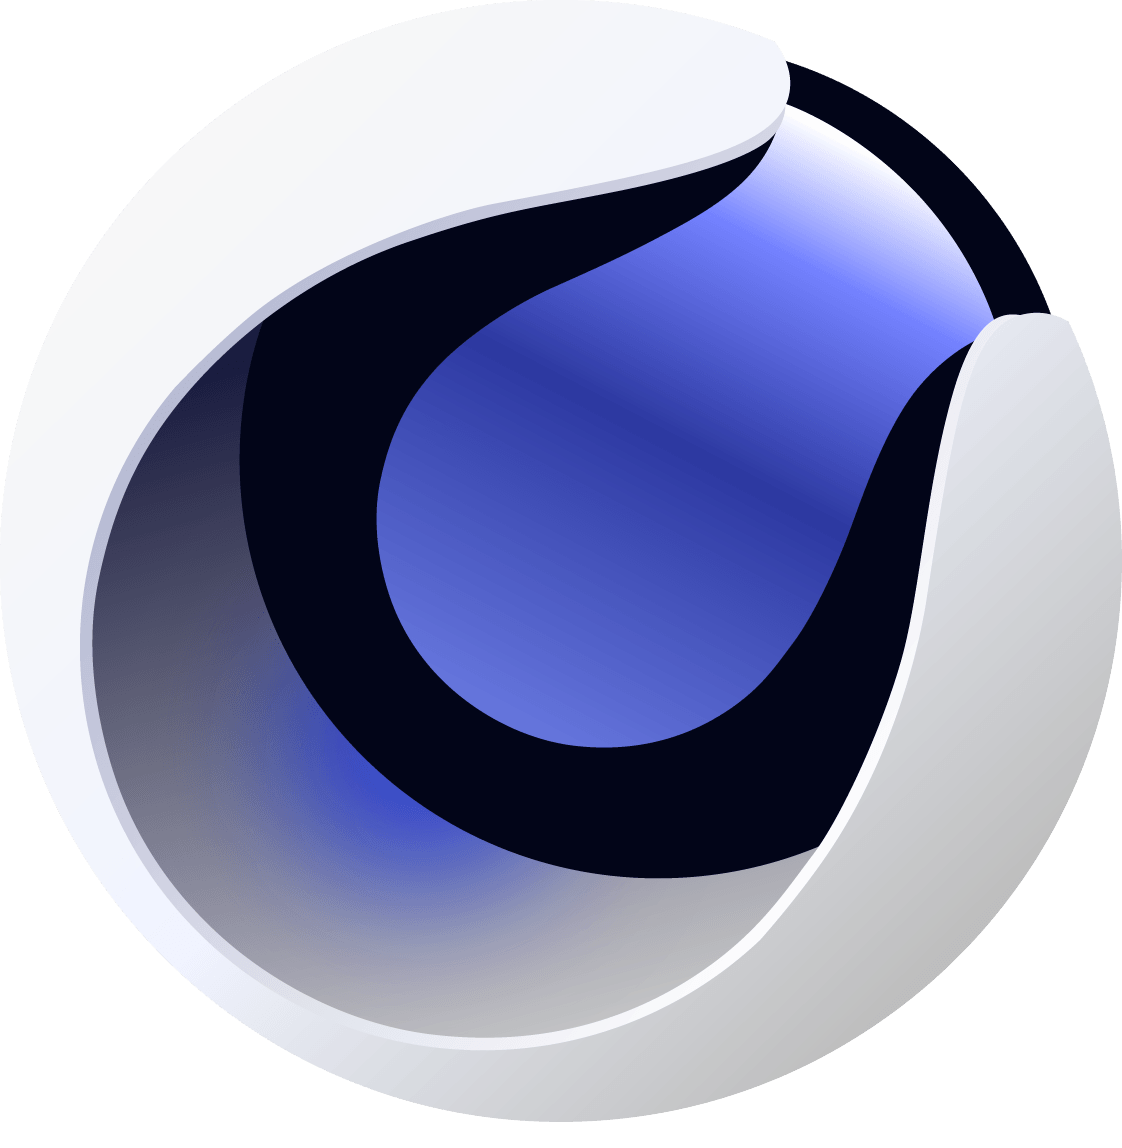 Maxon CINEMA 4D Studio 23.008 Crack Full Version Free Download